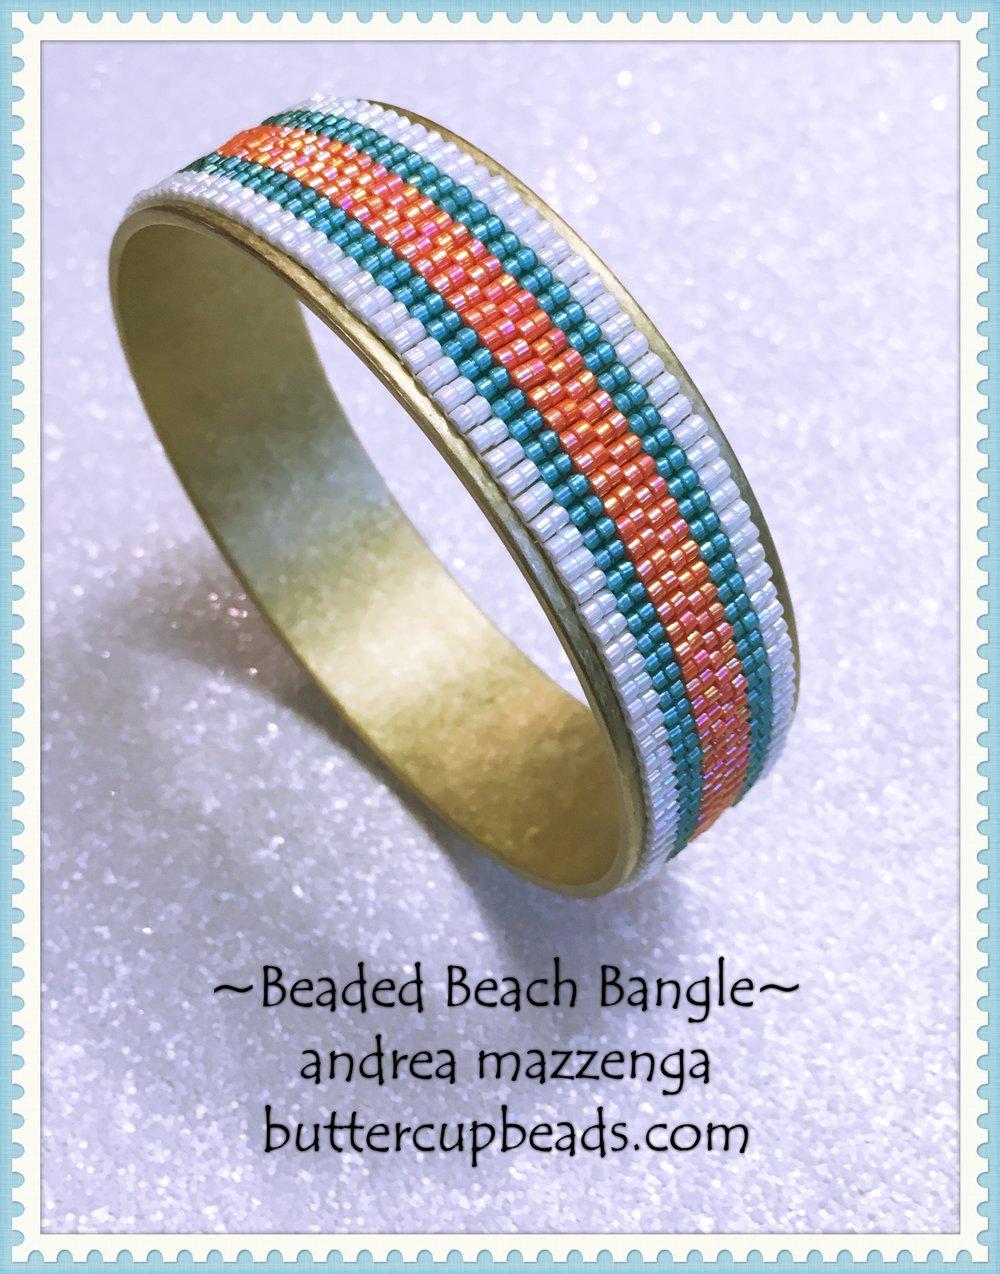 beach bangle cover.jpg